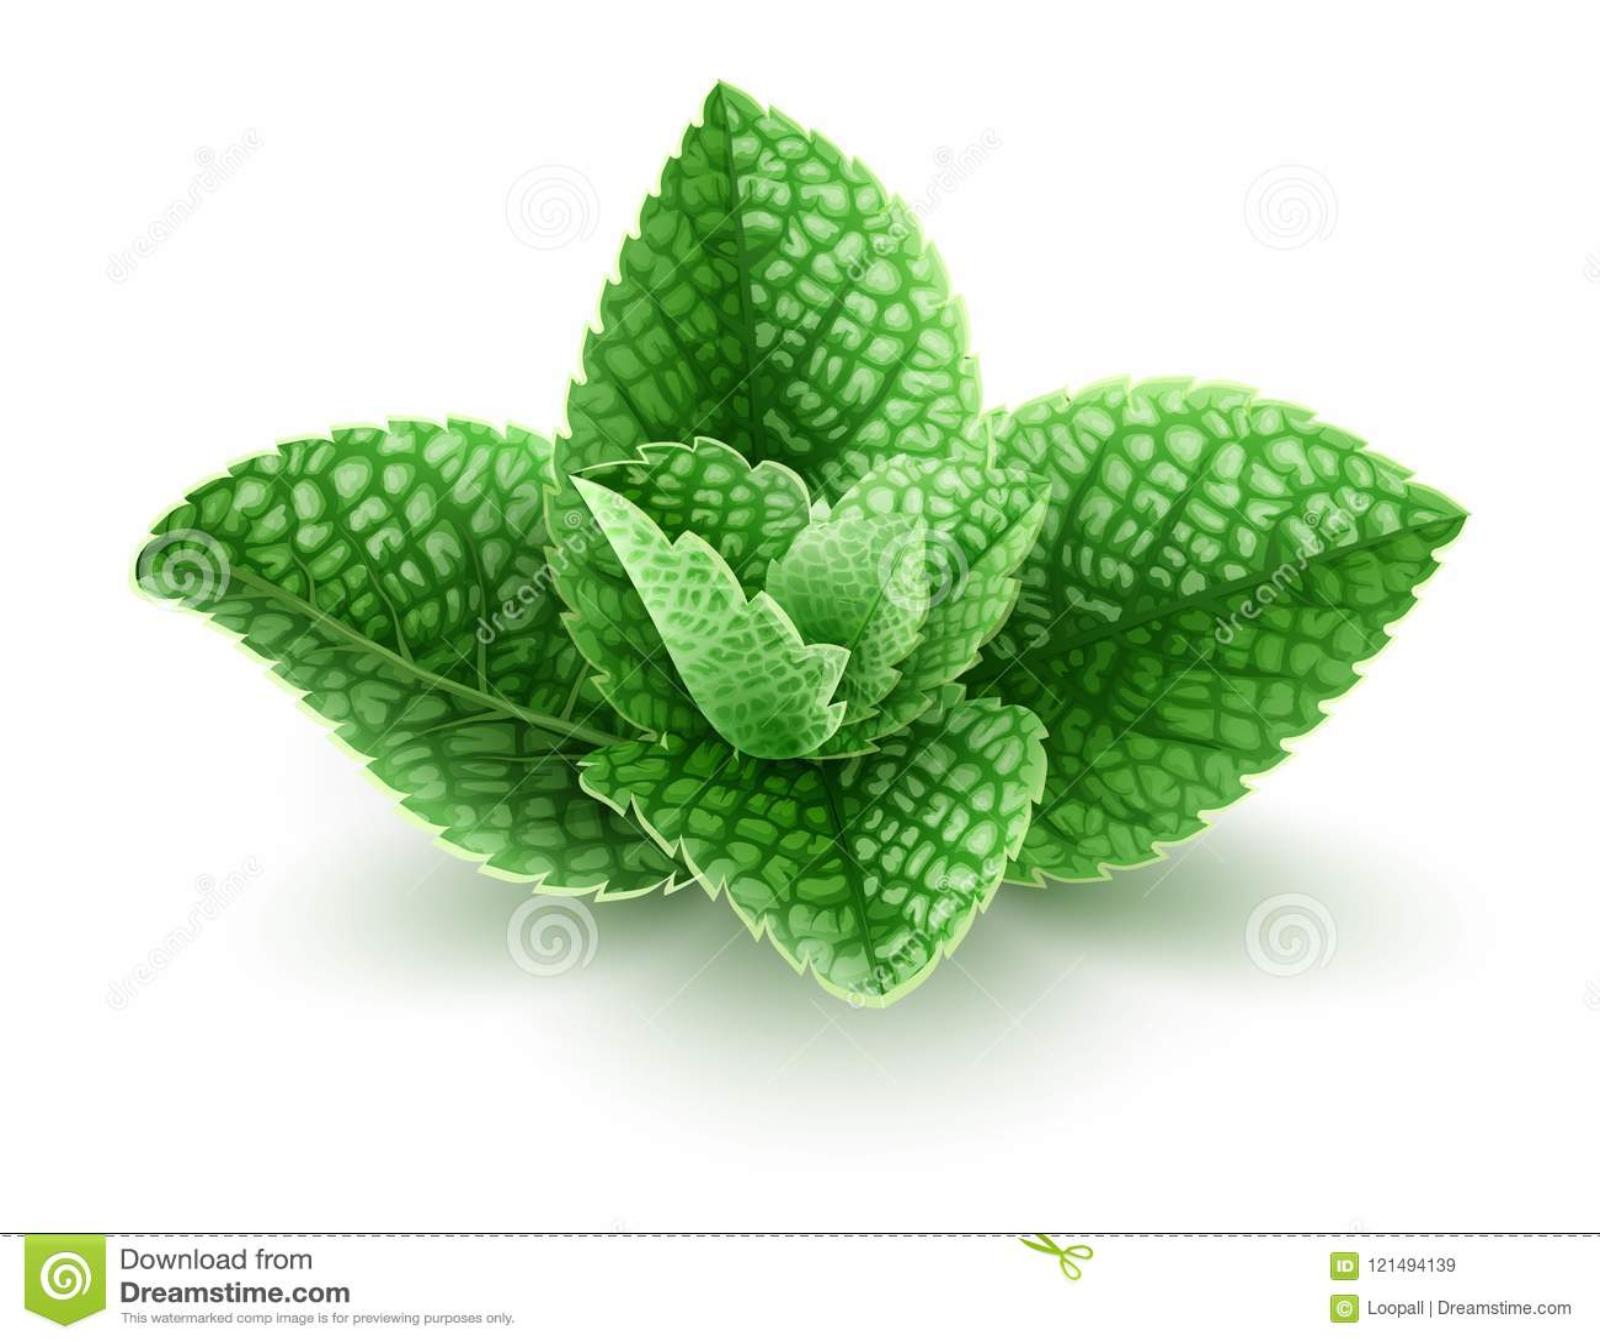 Verse groene muntbladeren voor mojitodrank